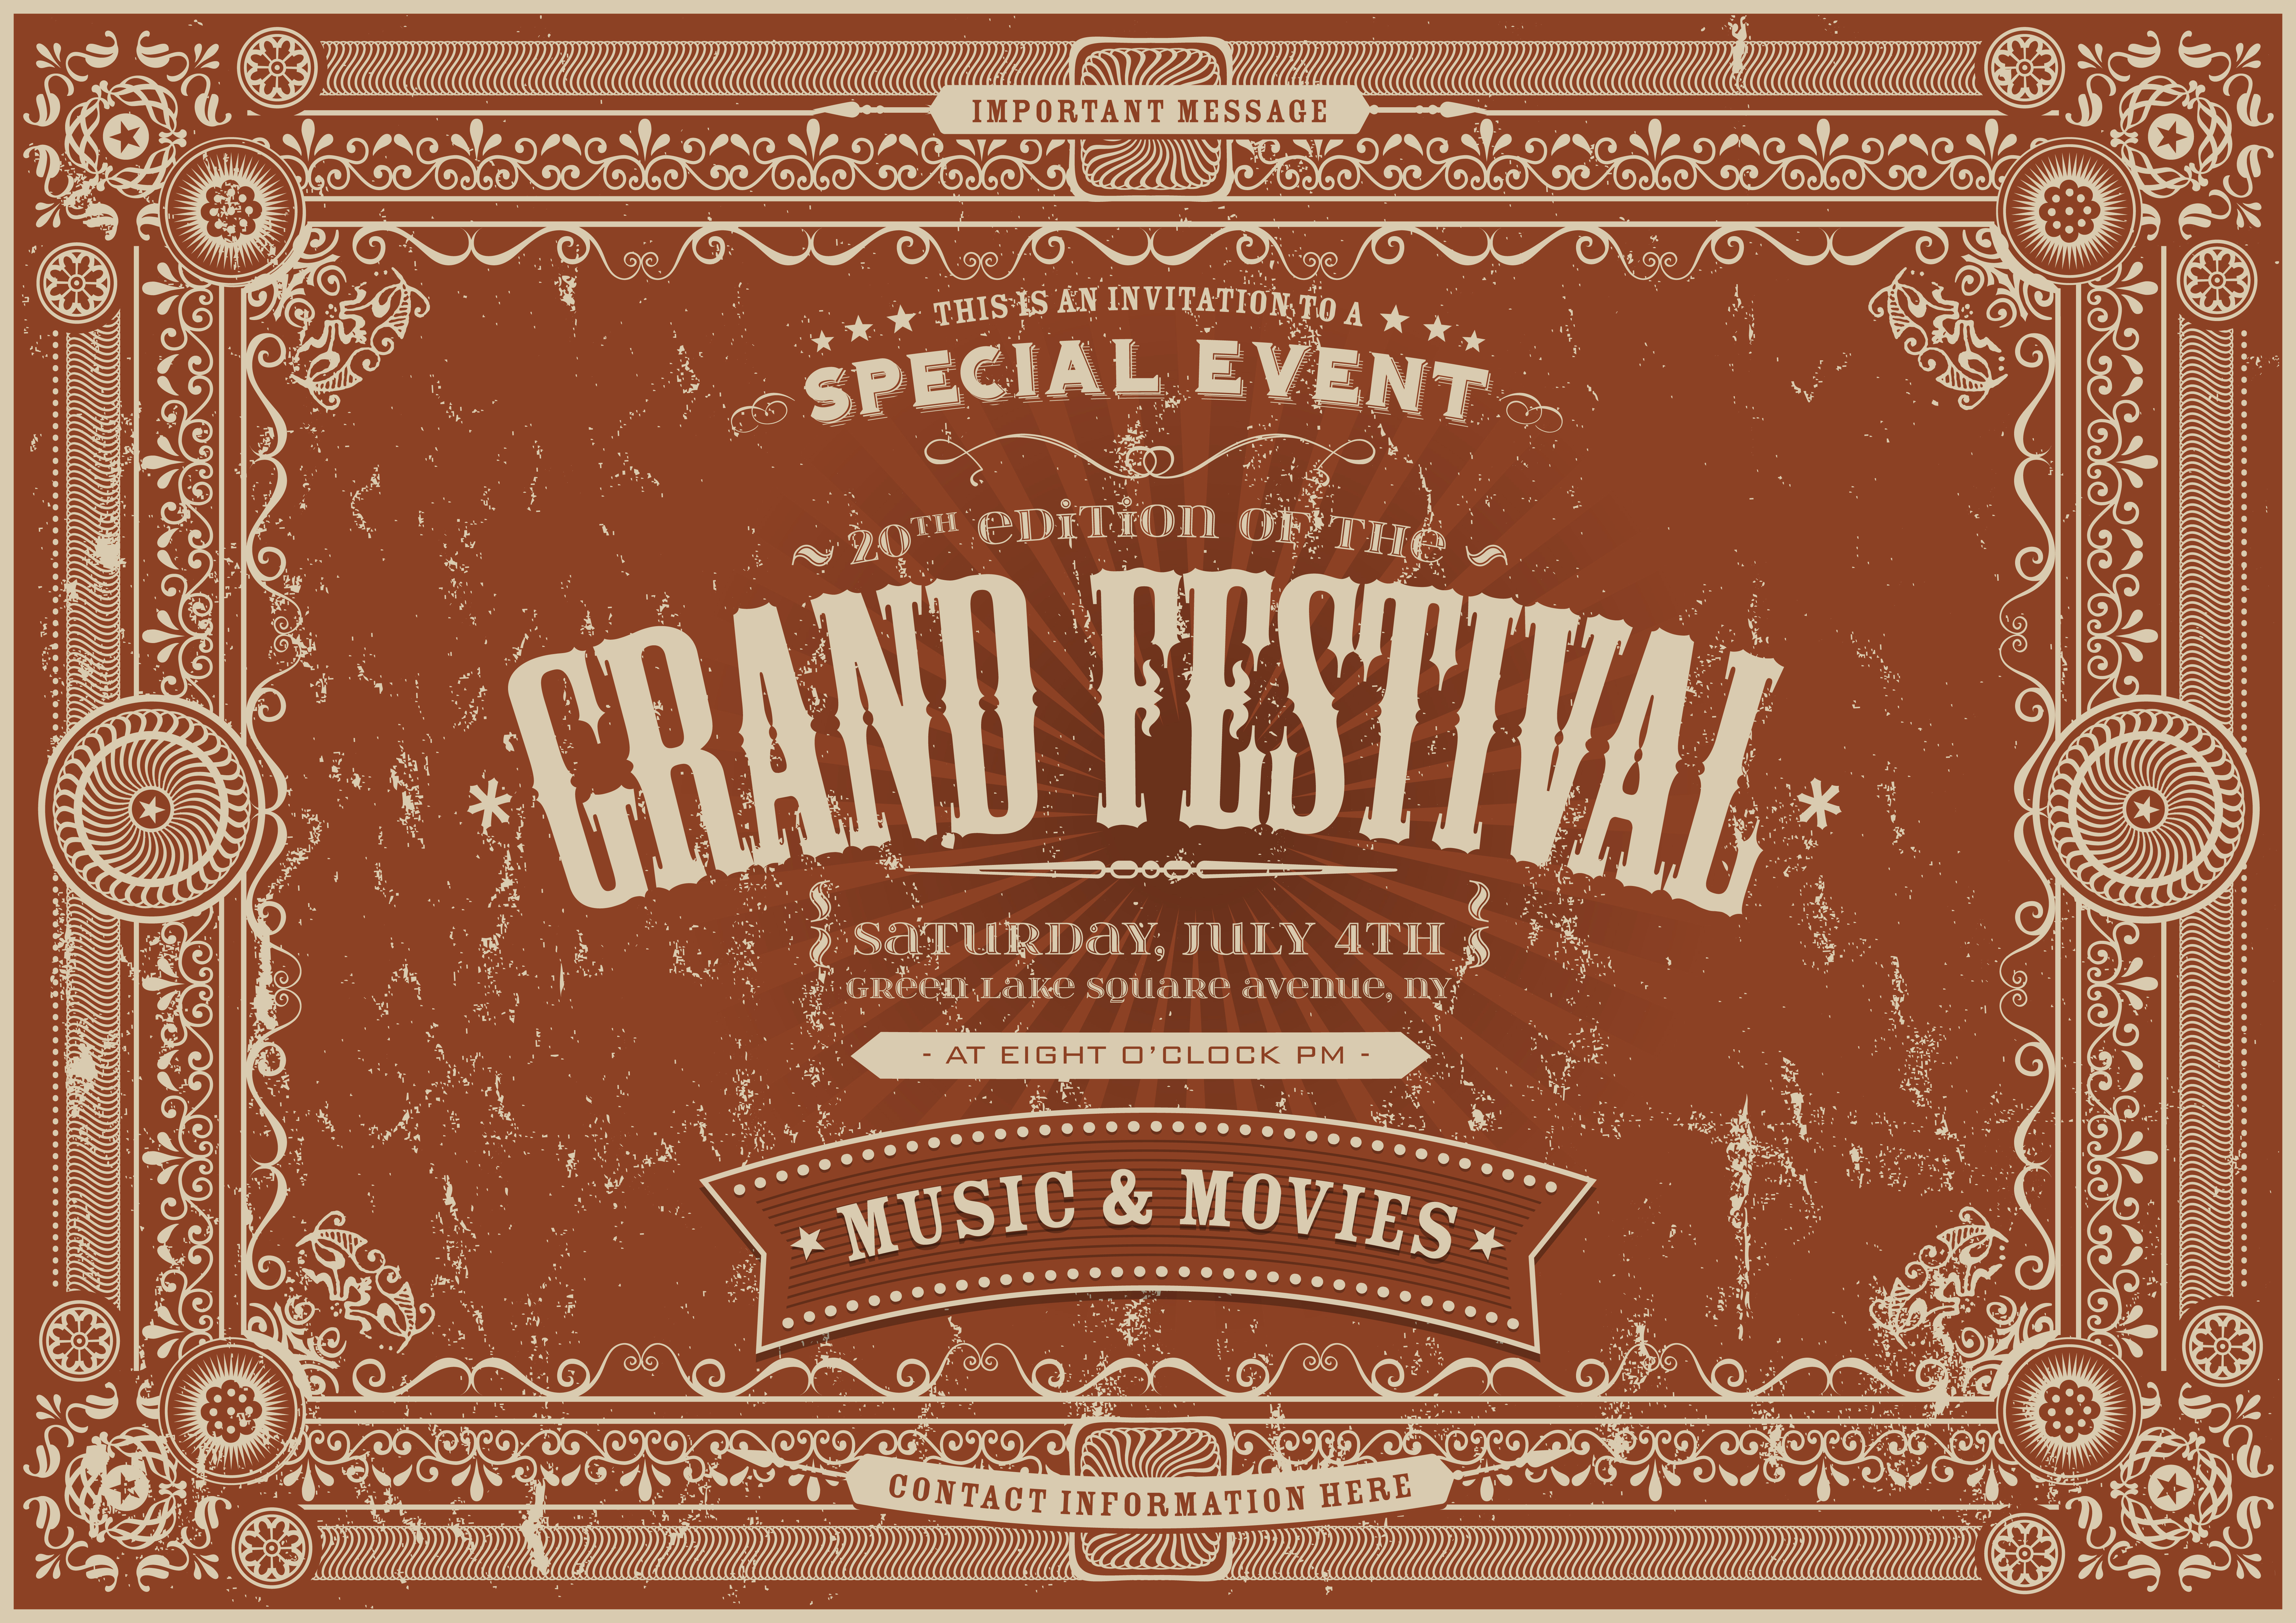 Vintage Retro Festival Poster Background - Download Free ...